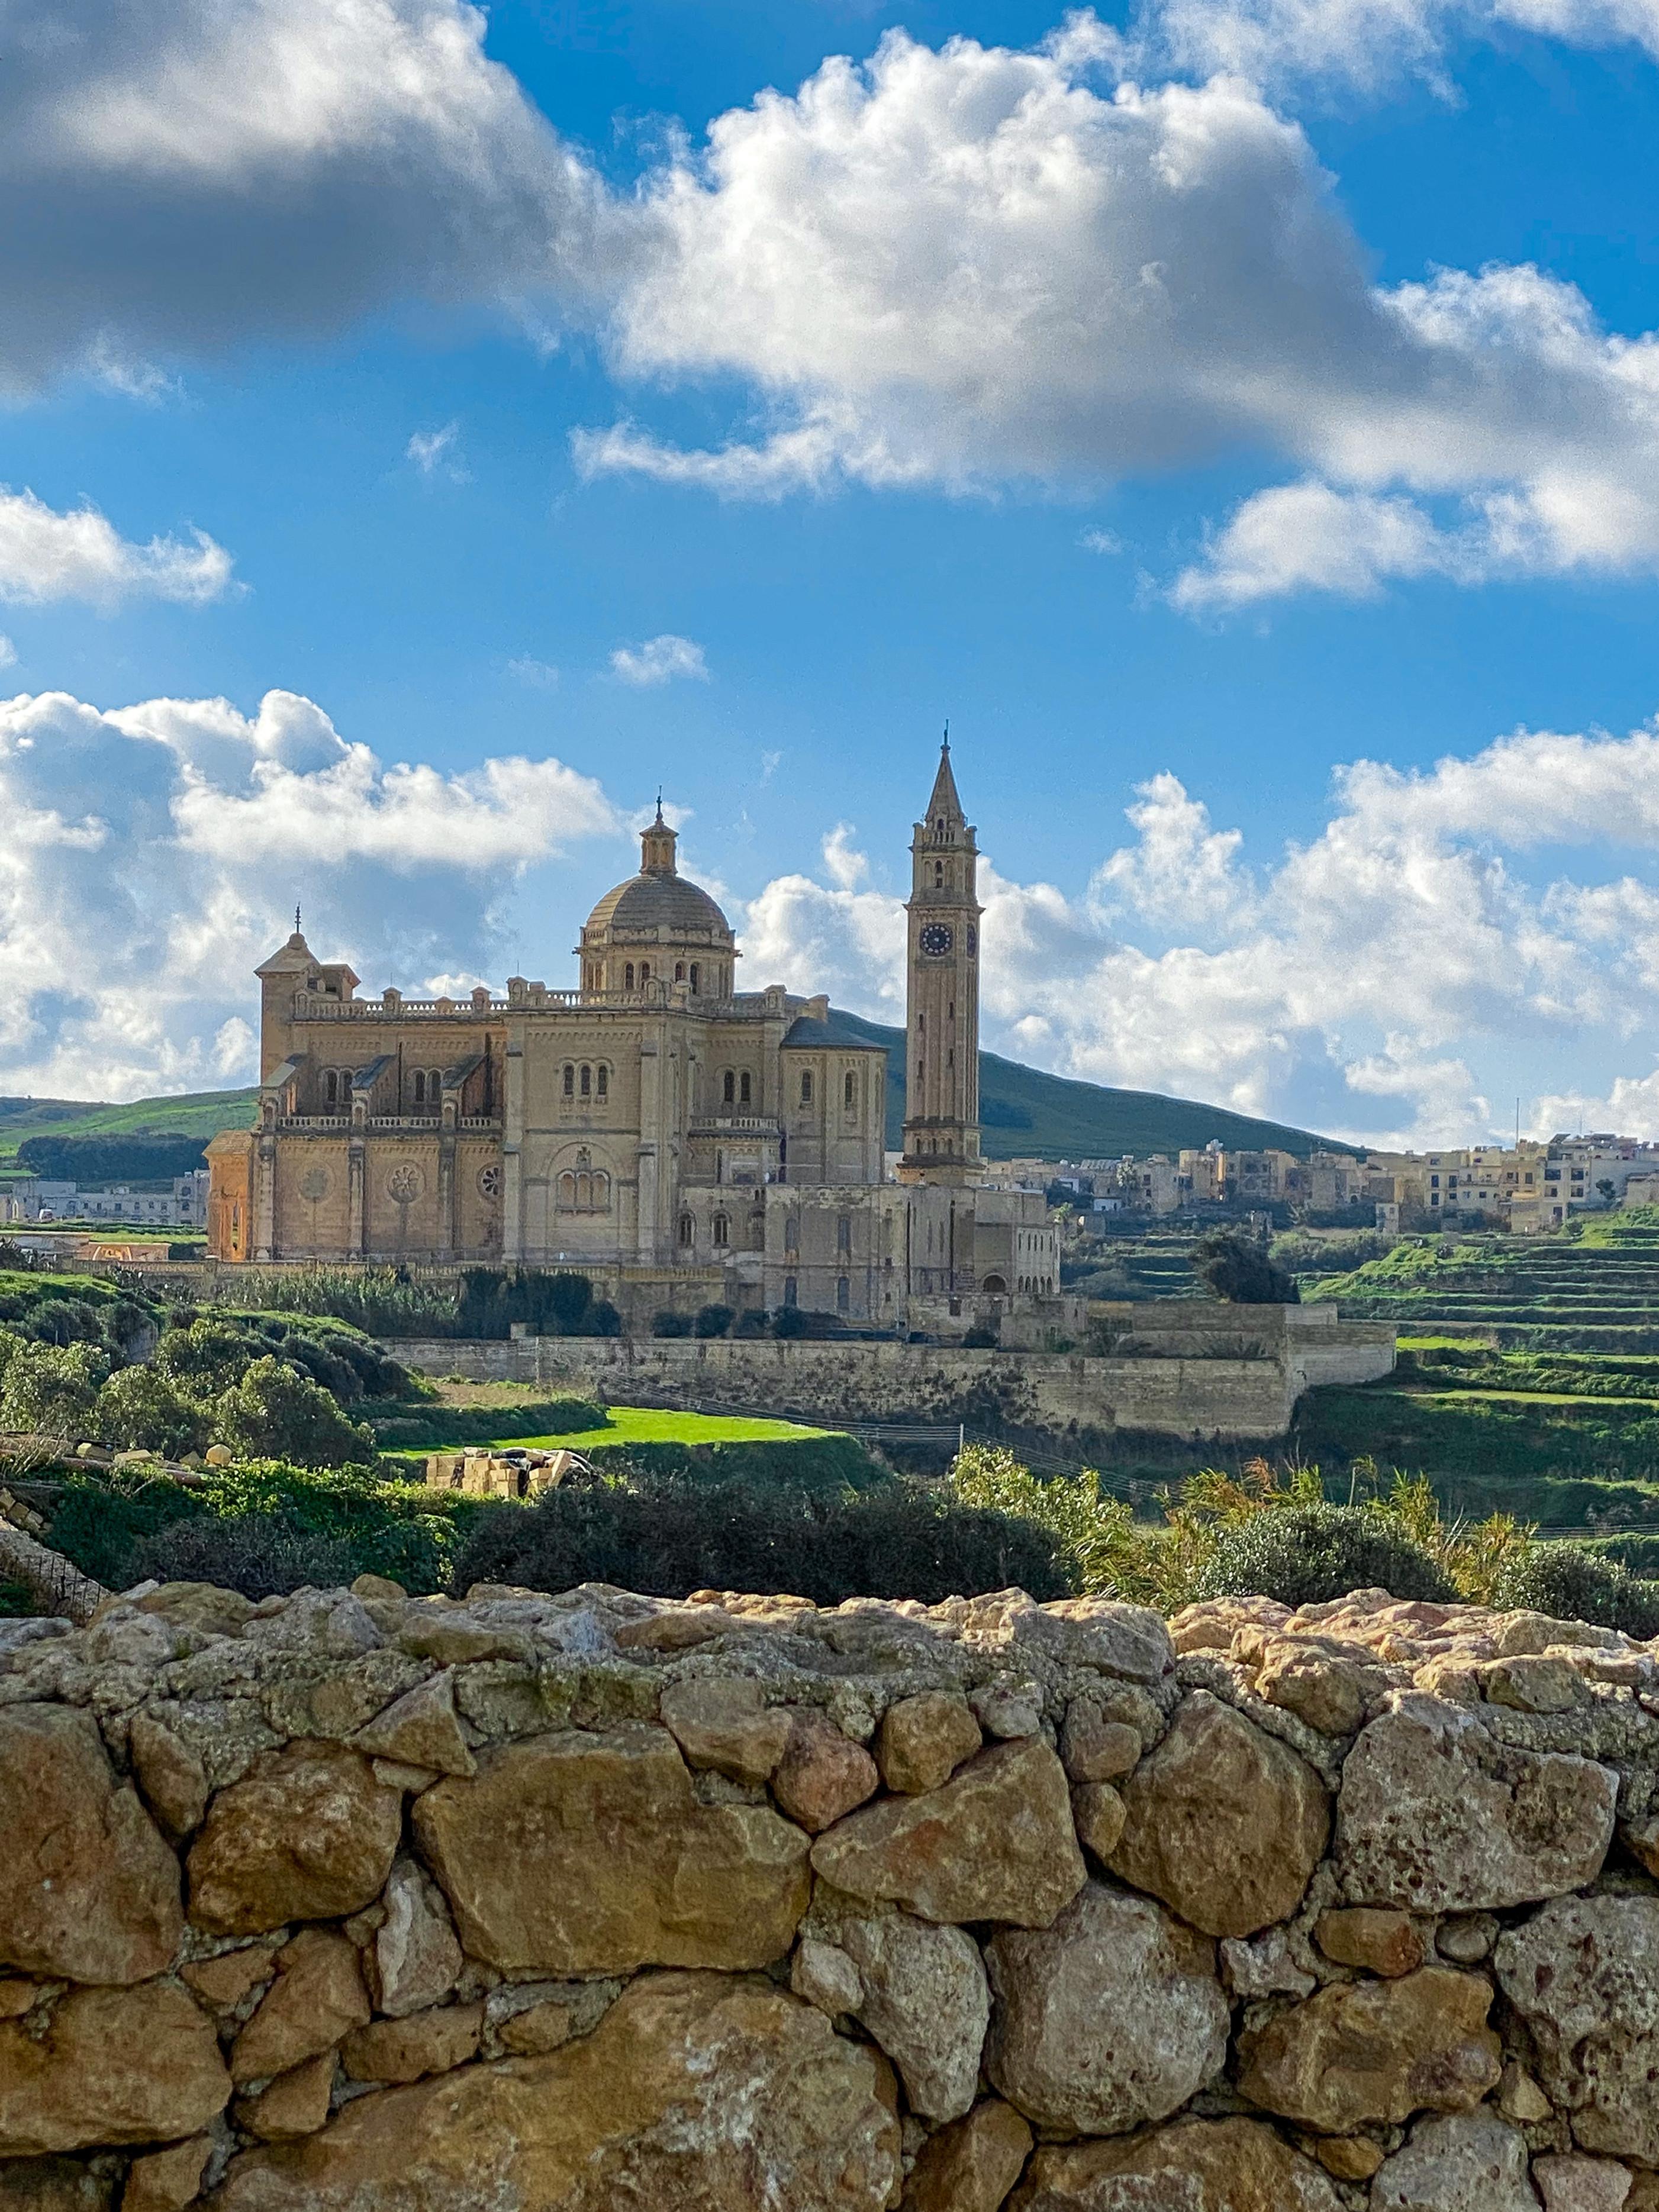 Comino, Gozo & St Paul's Islands